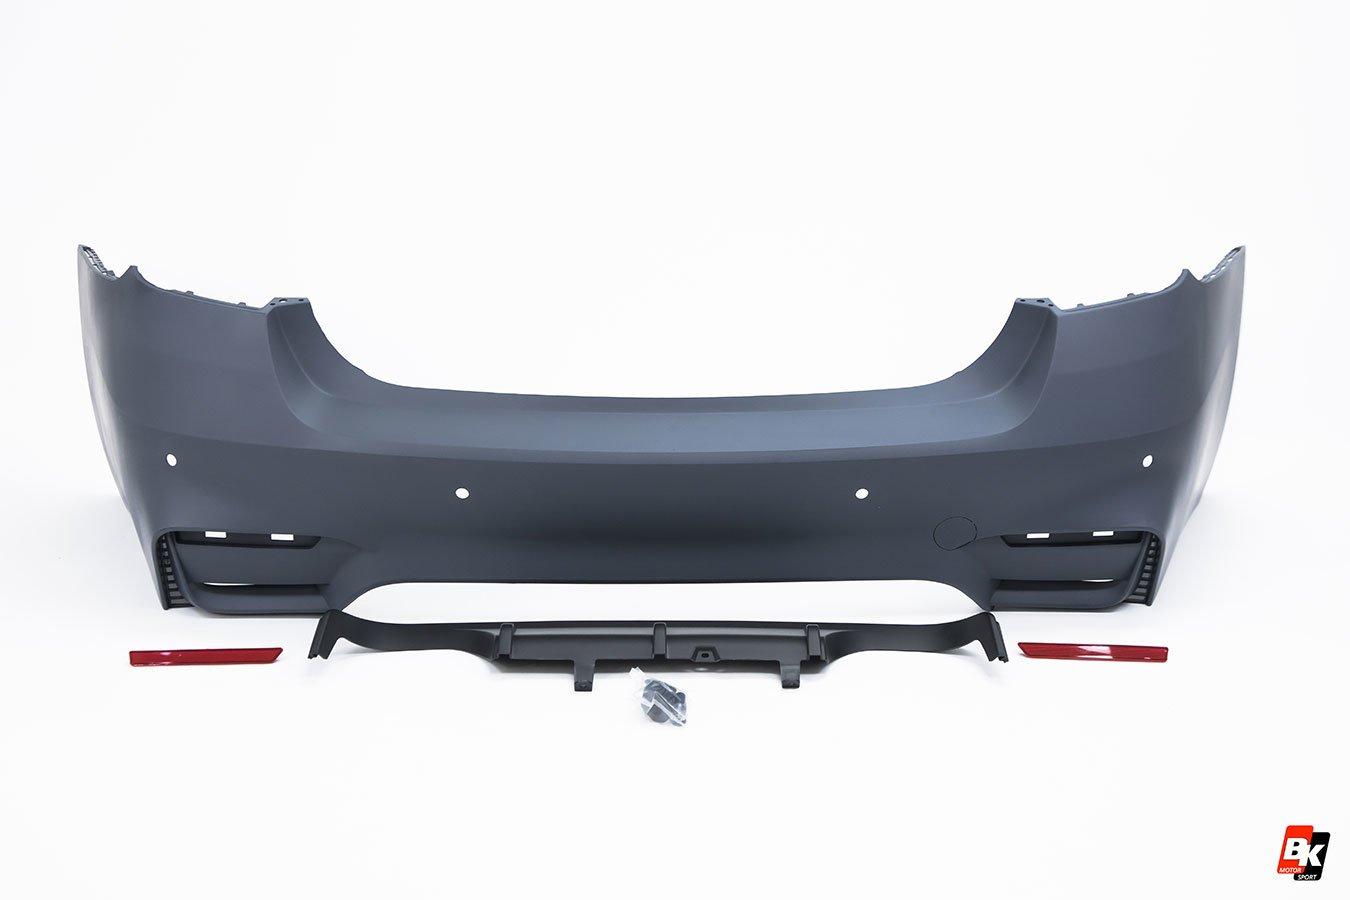 Bkm Rear Bumper Set M3 Style Fits Bmw Model 3 F30